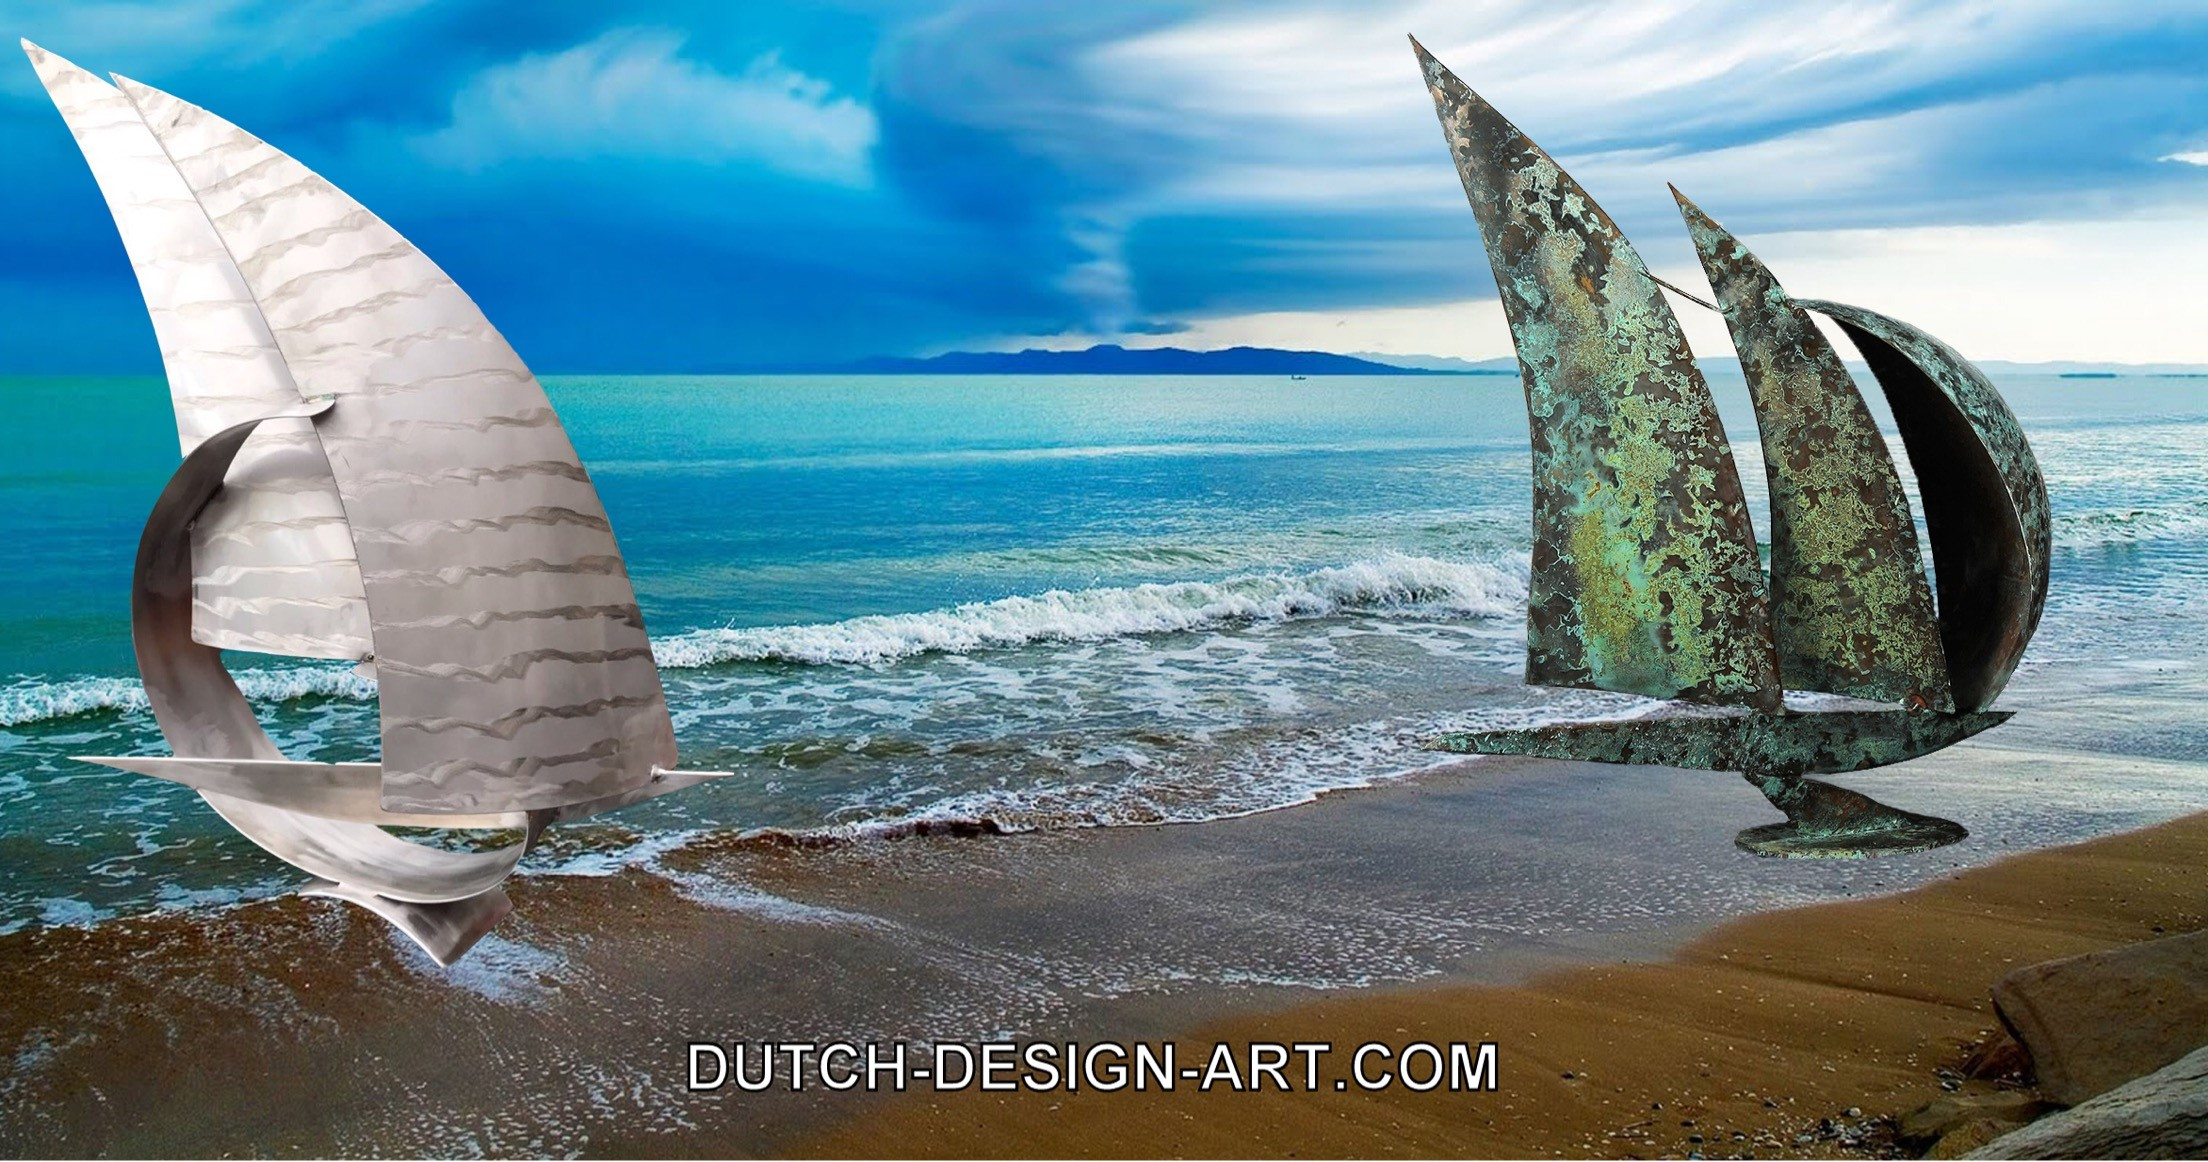 Dutch Design Art